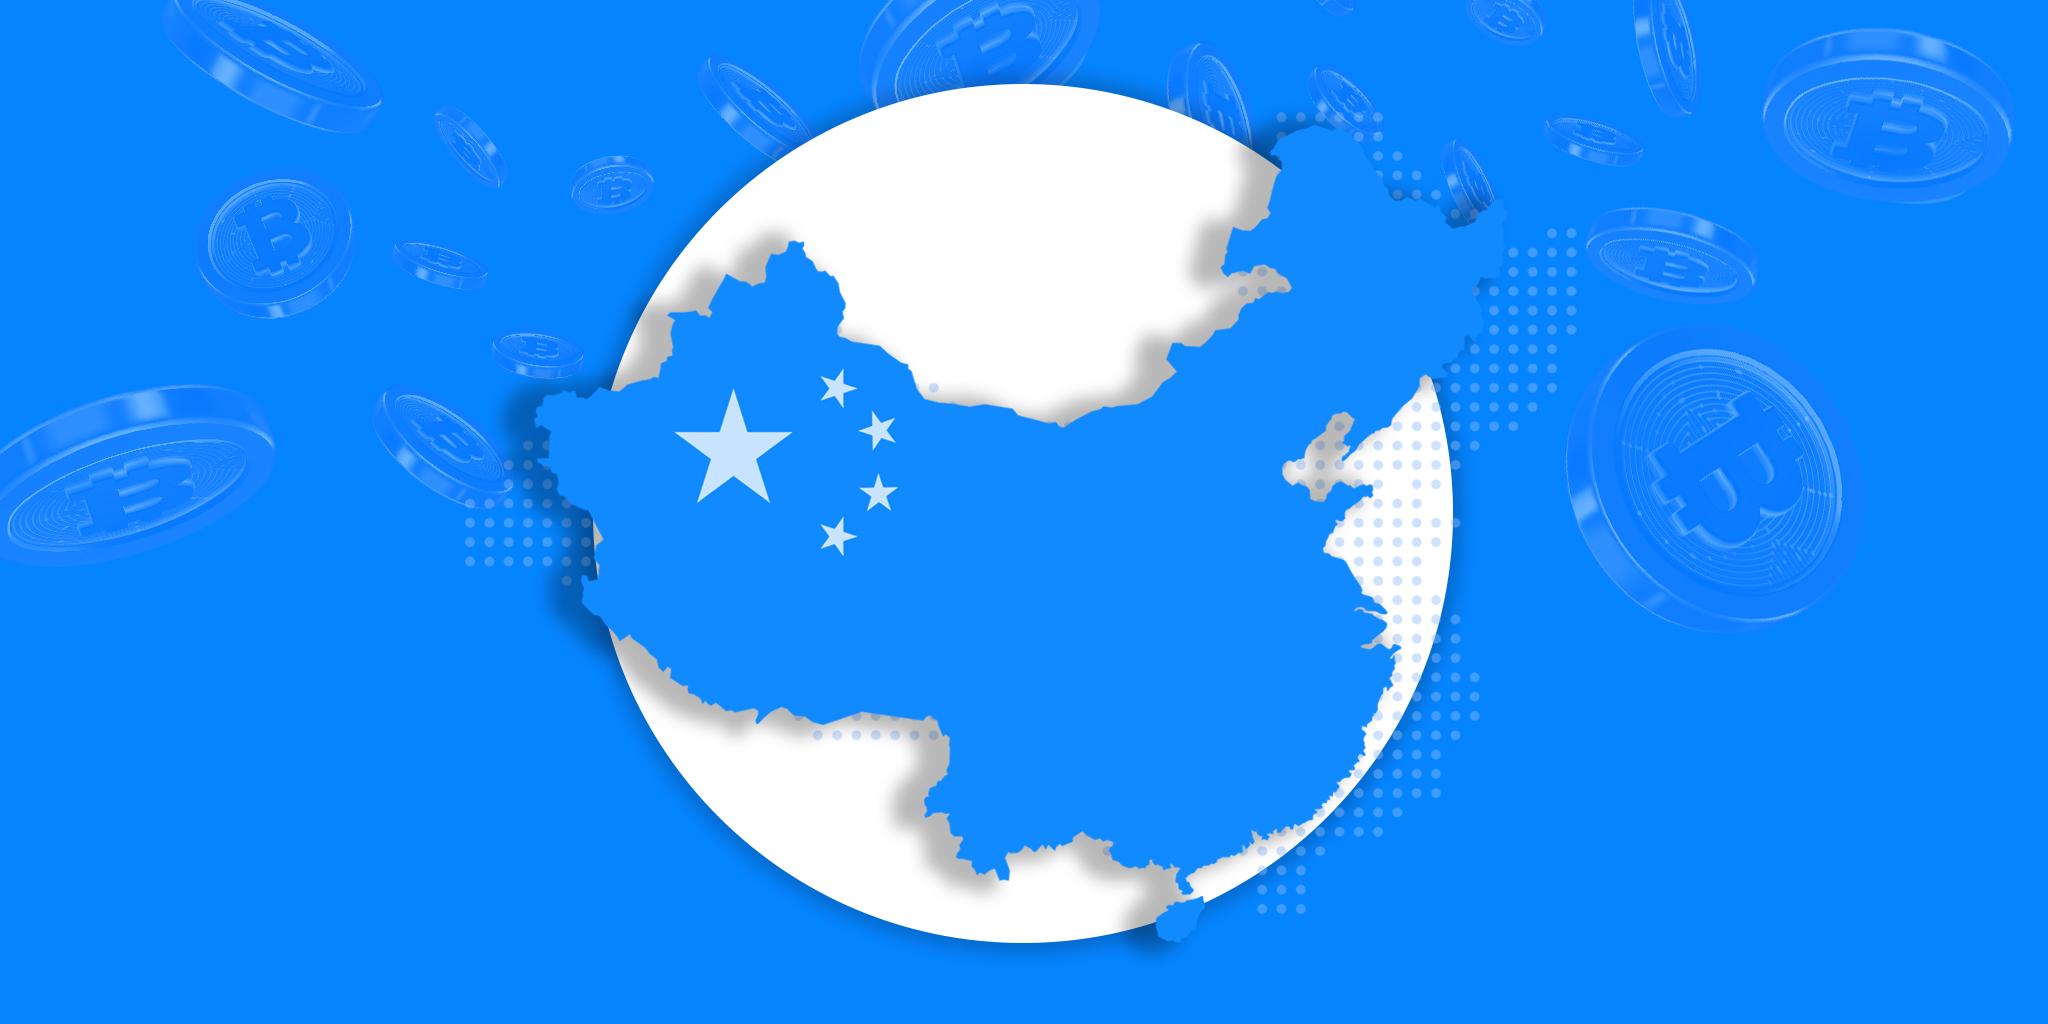 China cracks down on miners, Bitcoin price plummets